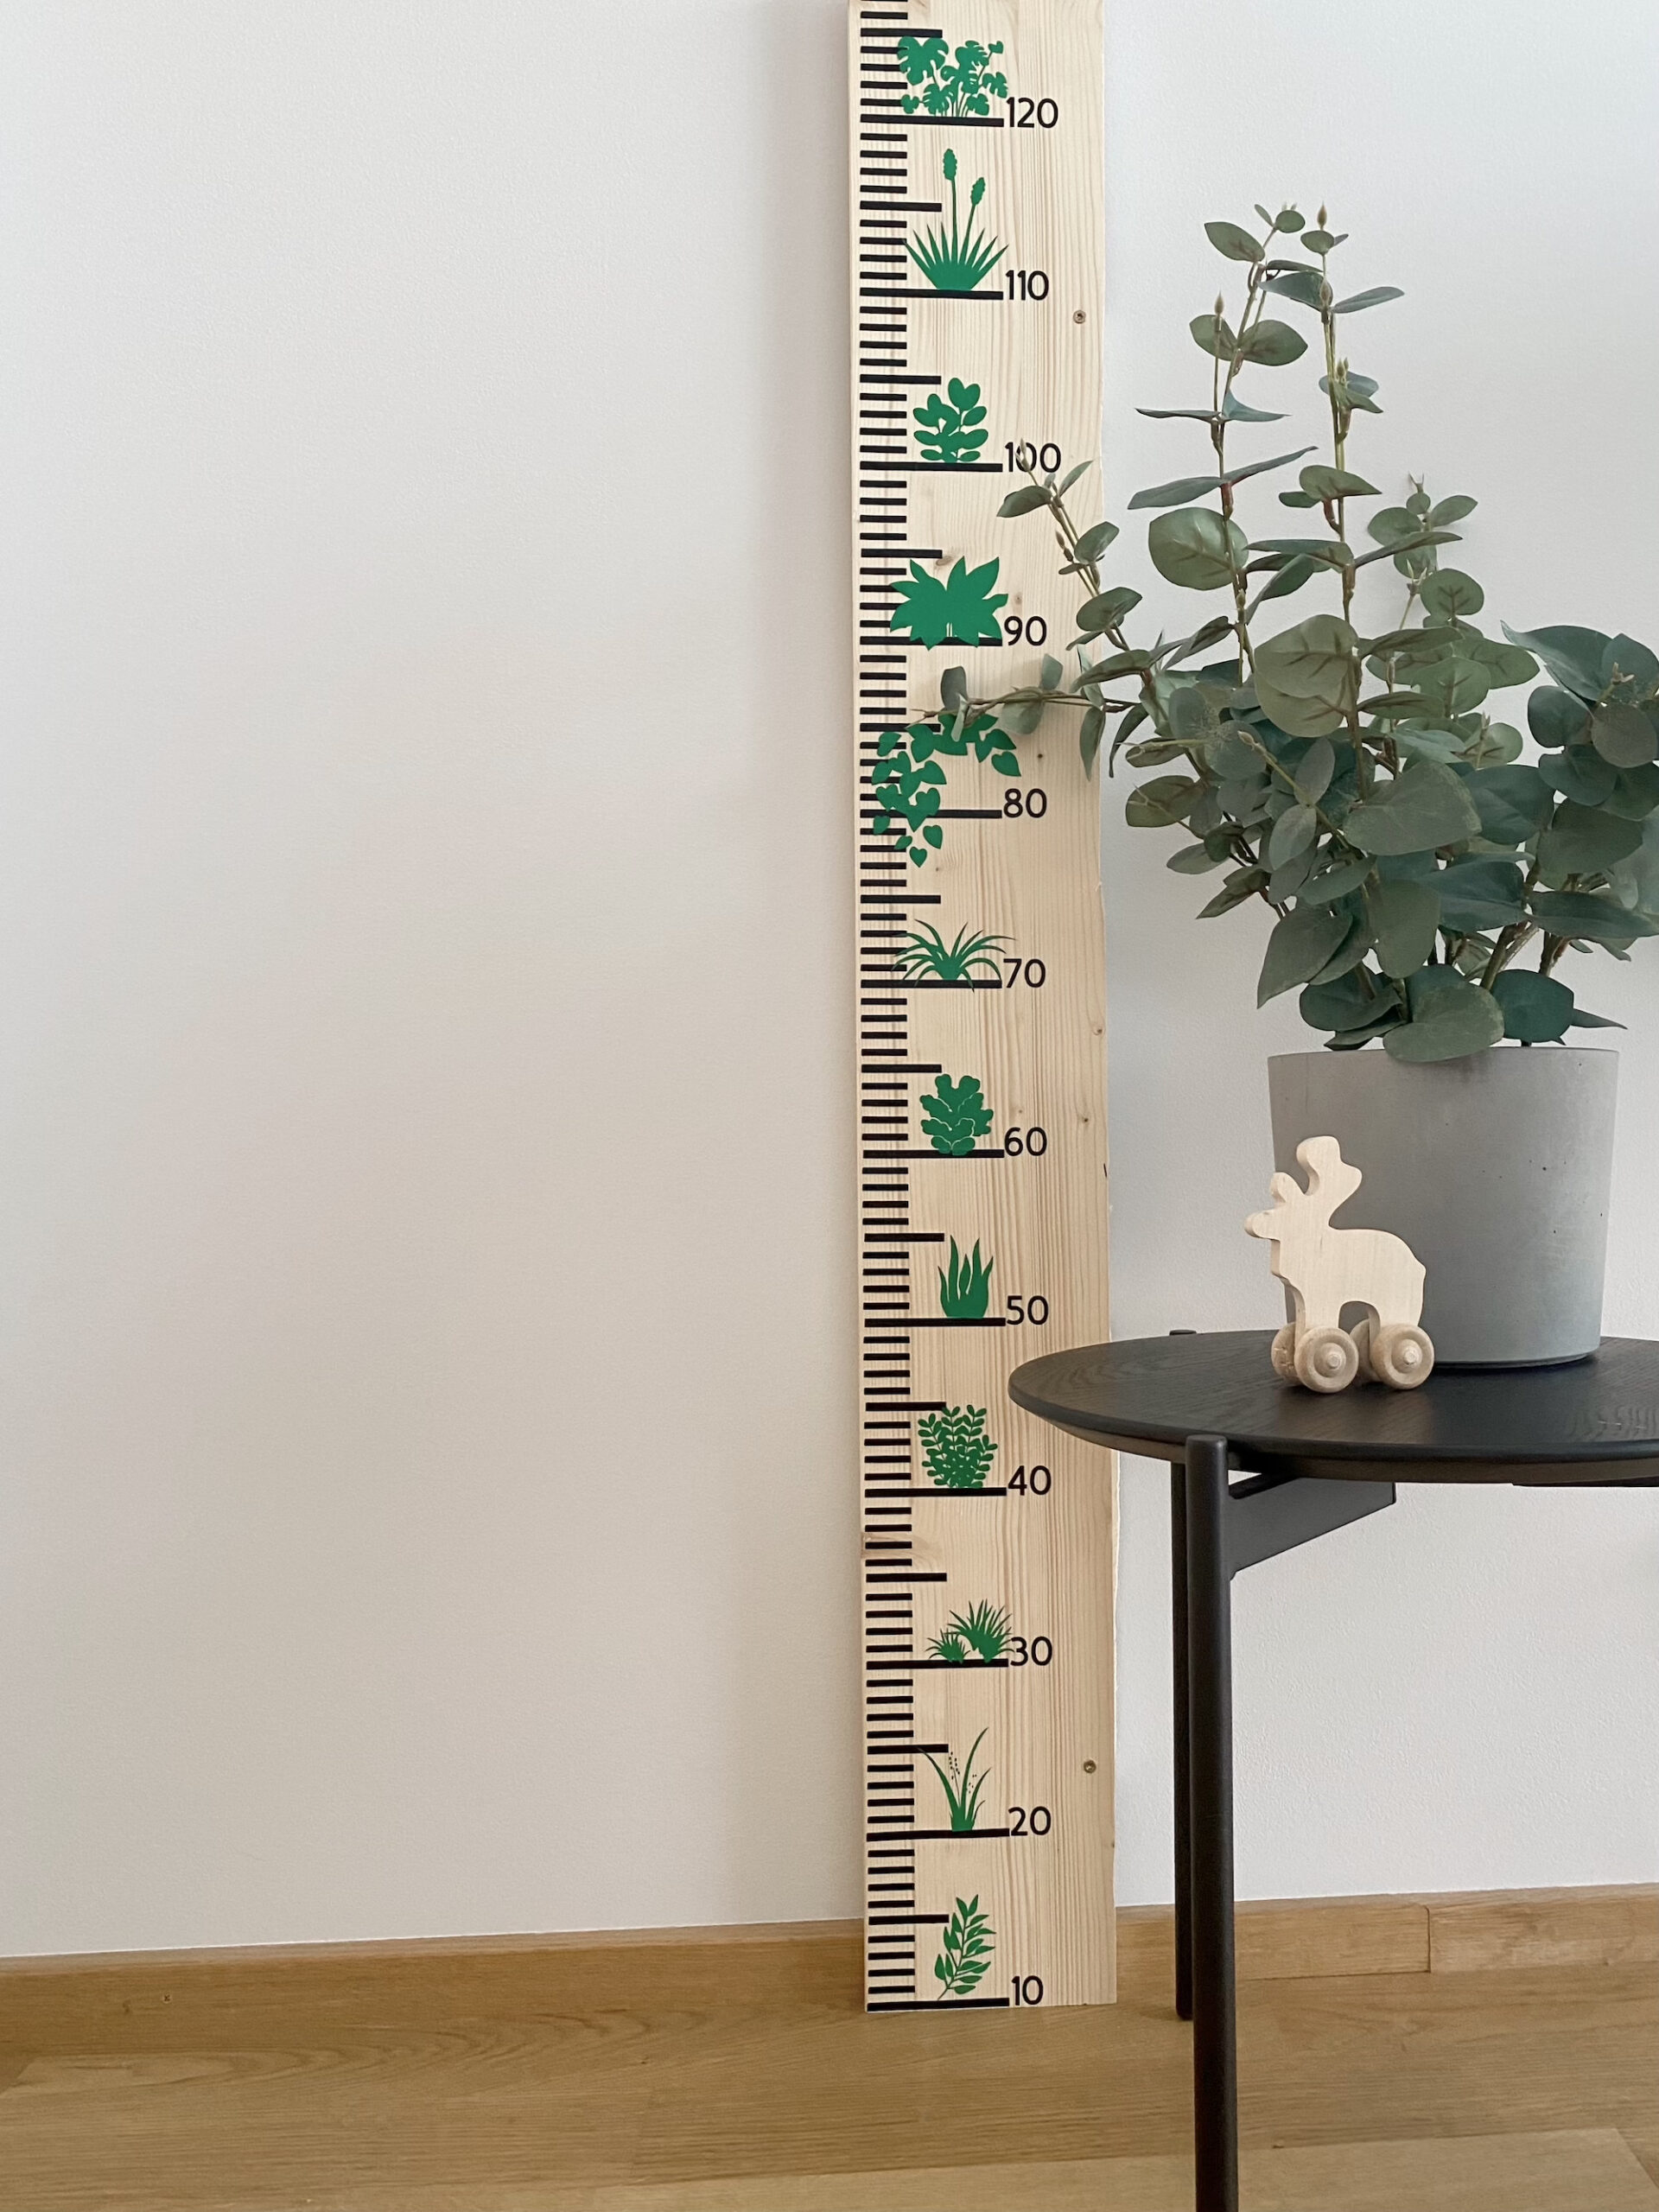 DIY cricut maker 3 cadeau naissance bébé garçon